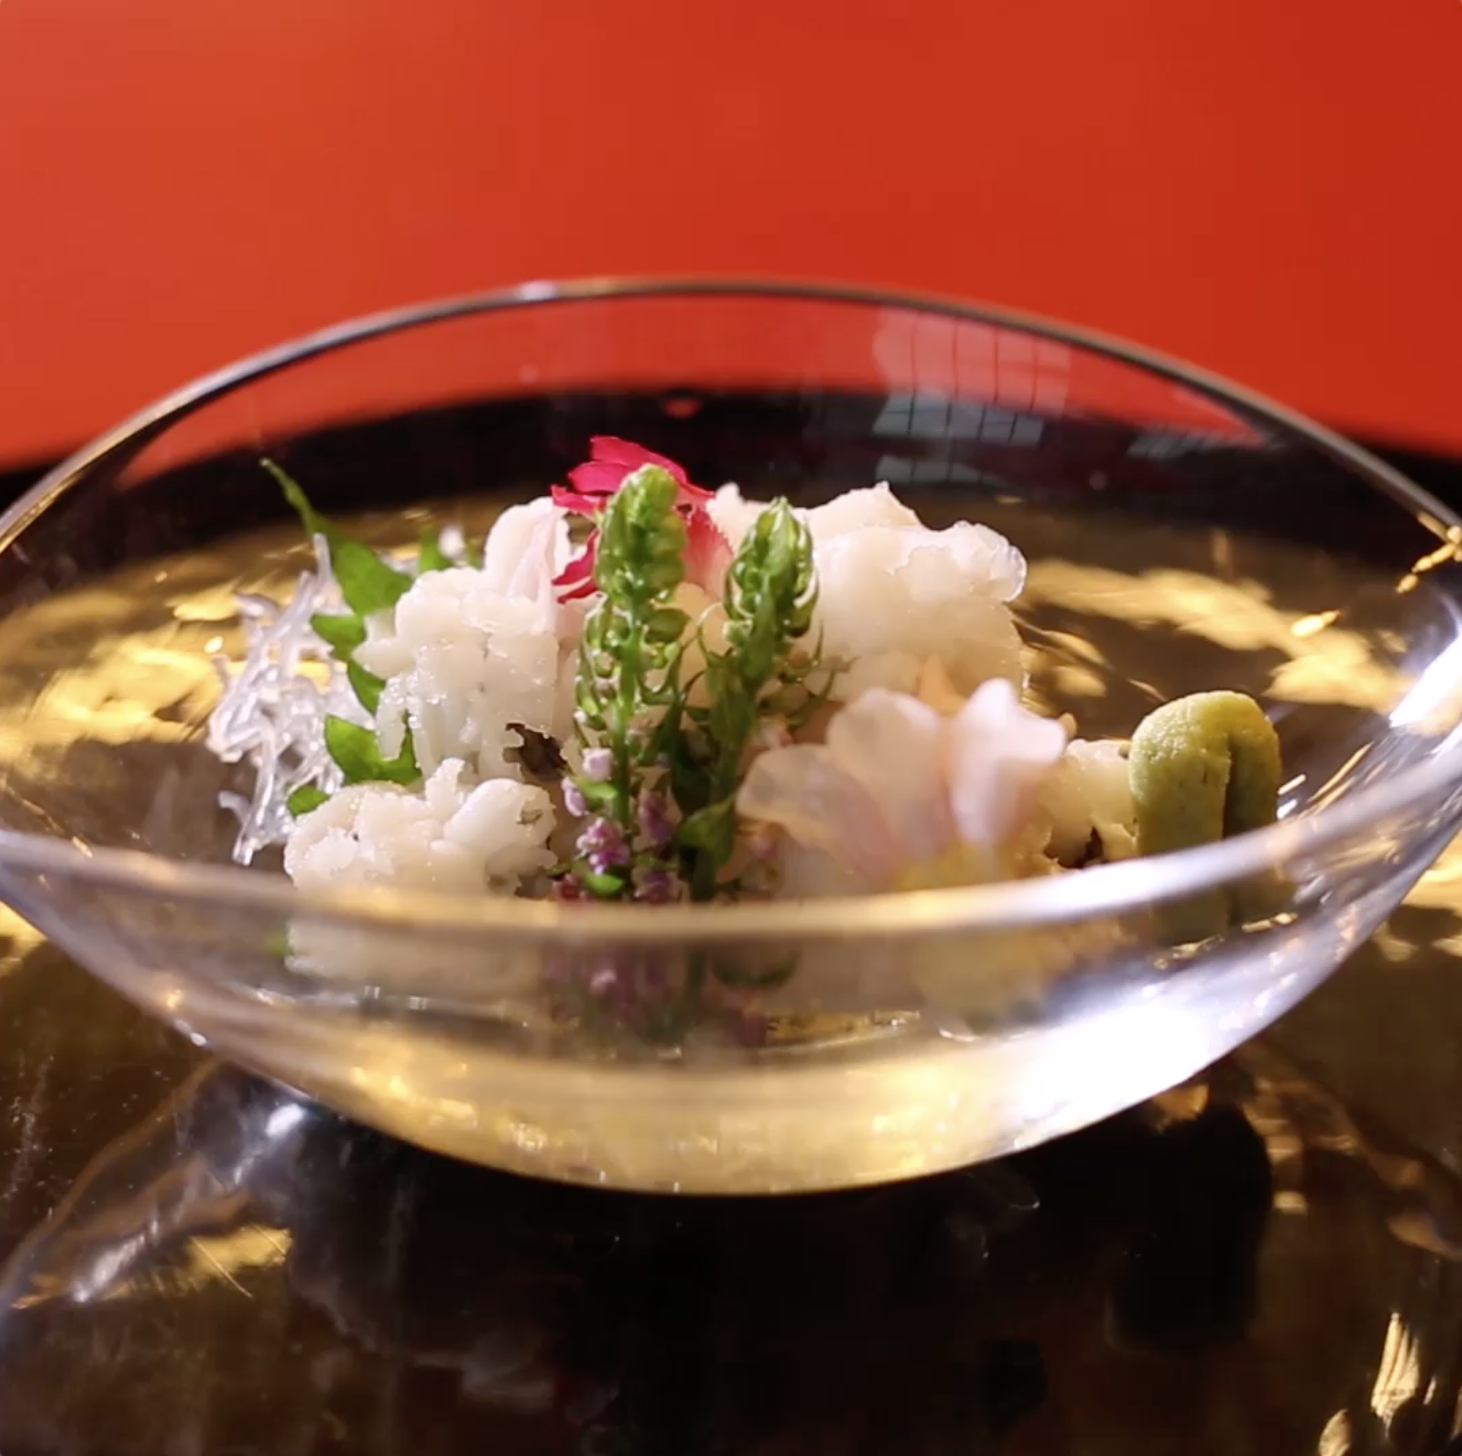 Conger pike cooked in oil Toyonaka Sakurae